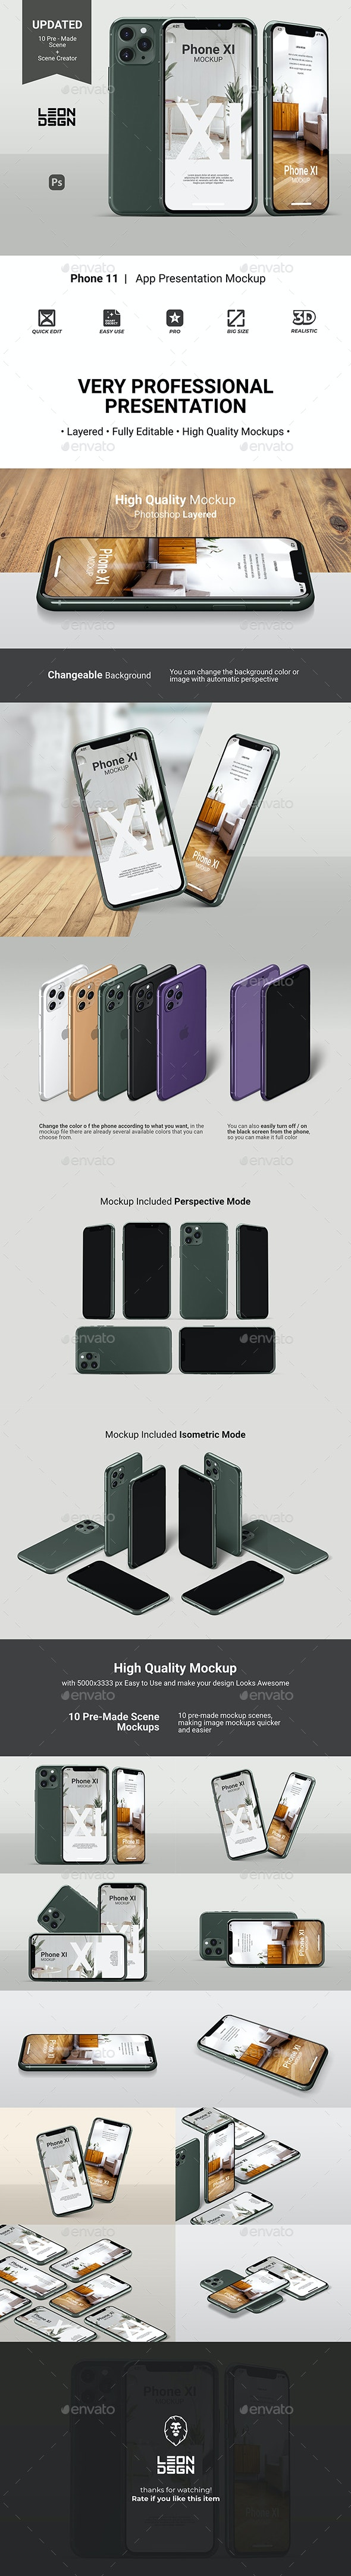 Phone 11 - App Presentation Mockup - Mobile Displays